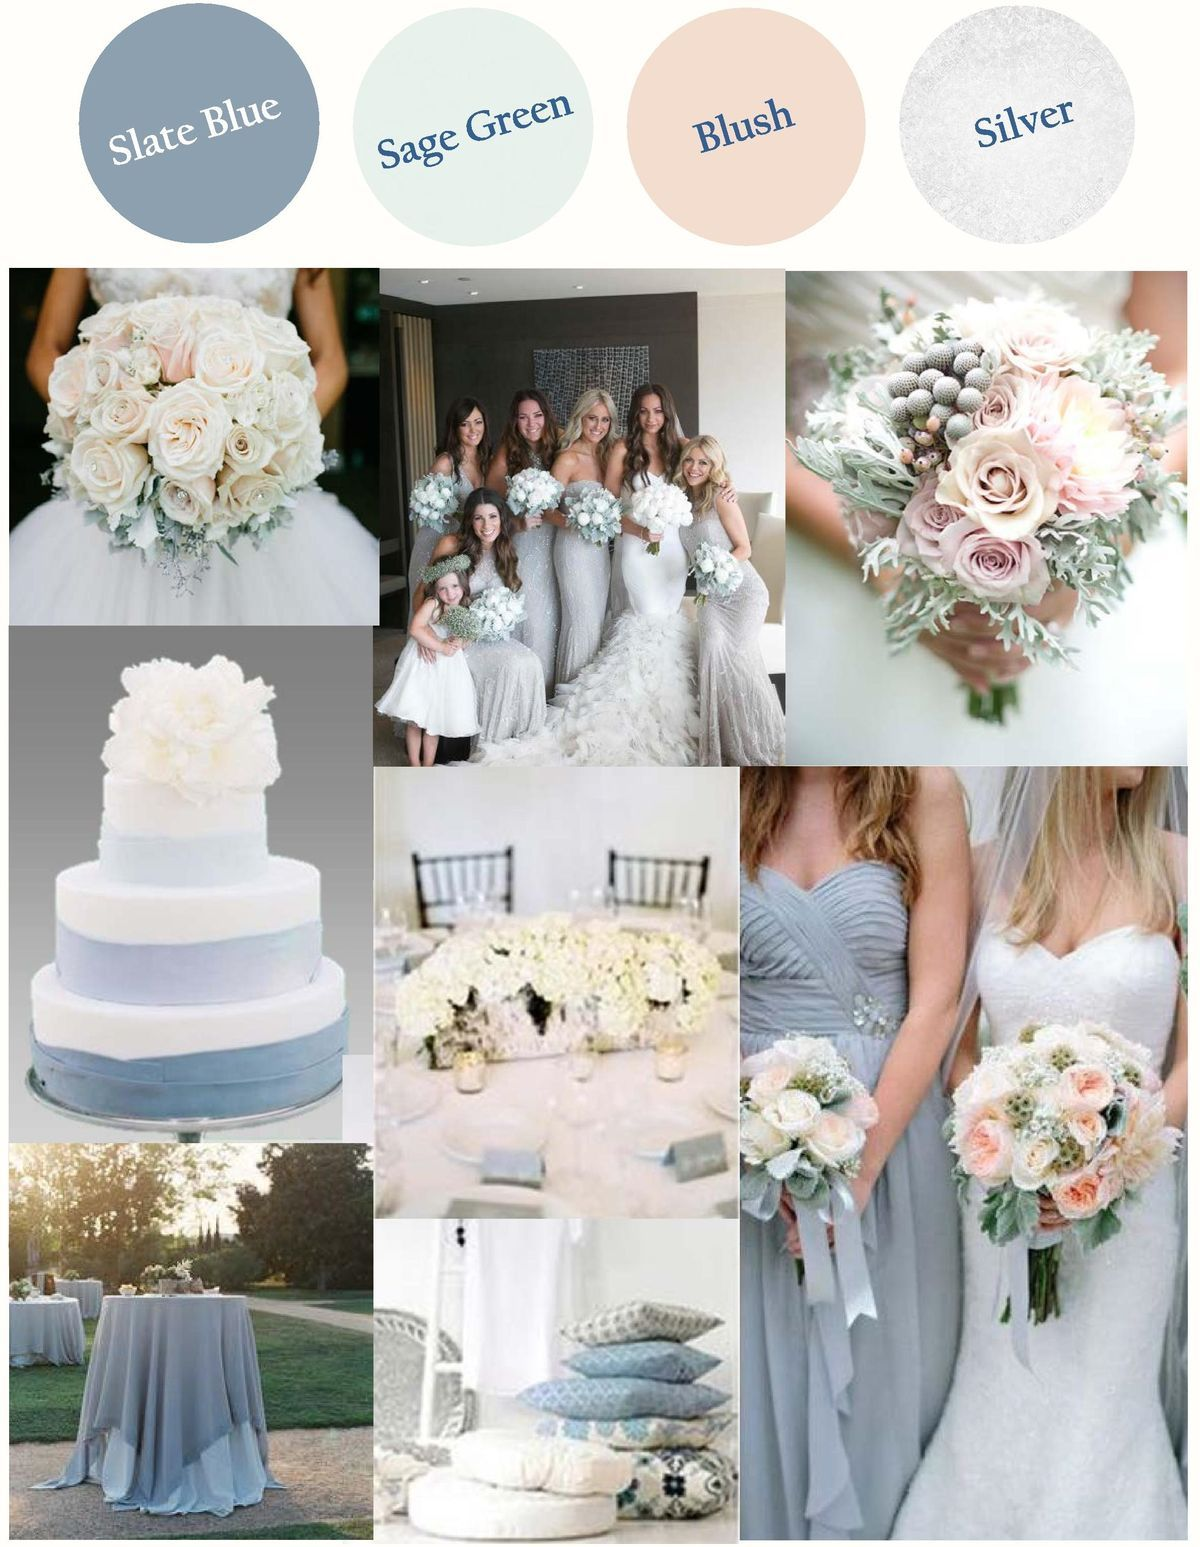 Top-design-bilder winter wedding silver  best photos  wedding stuff  pinterest